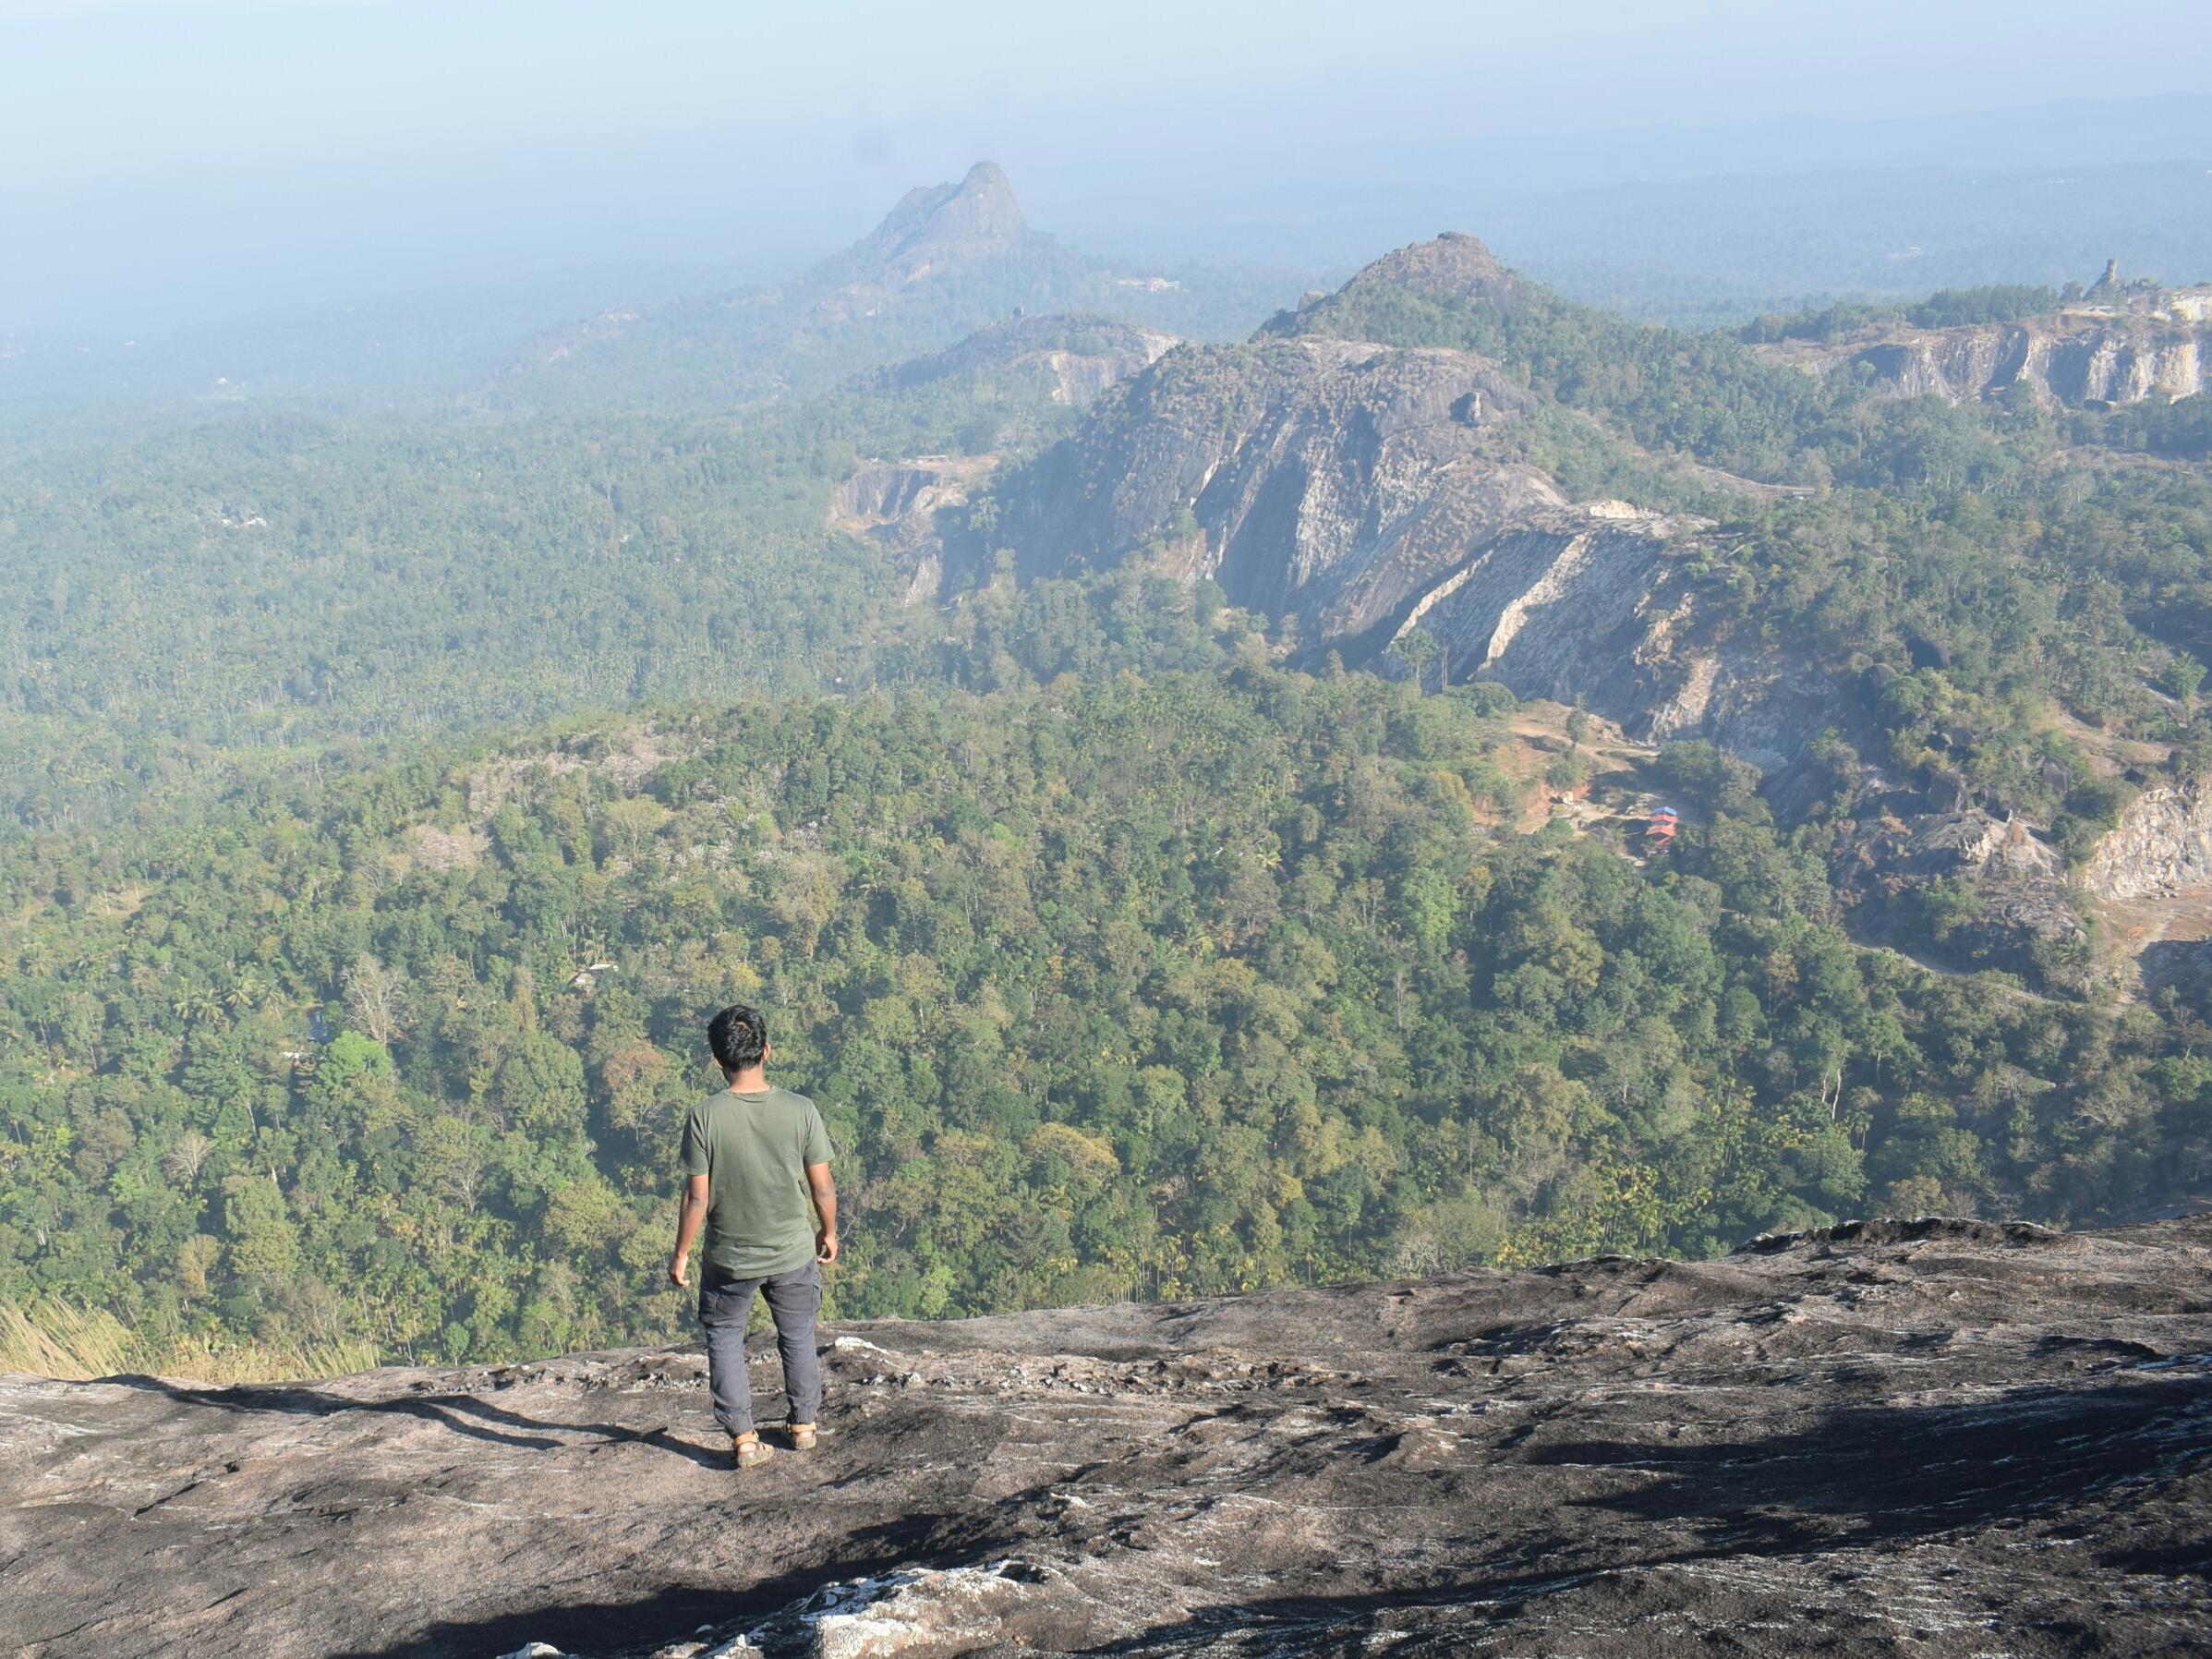 Man standing at hilltop